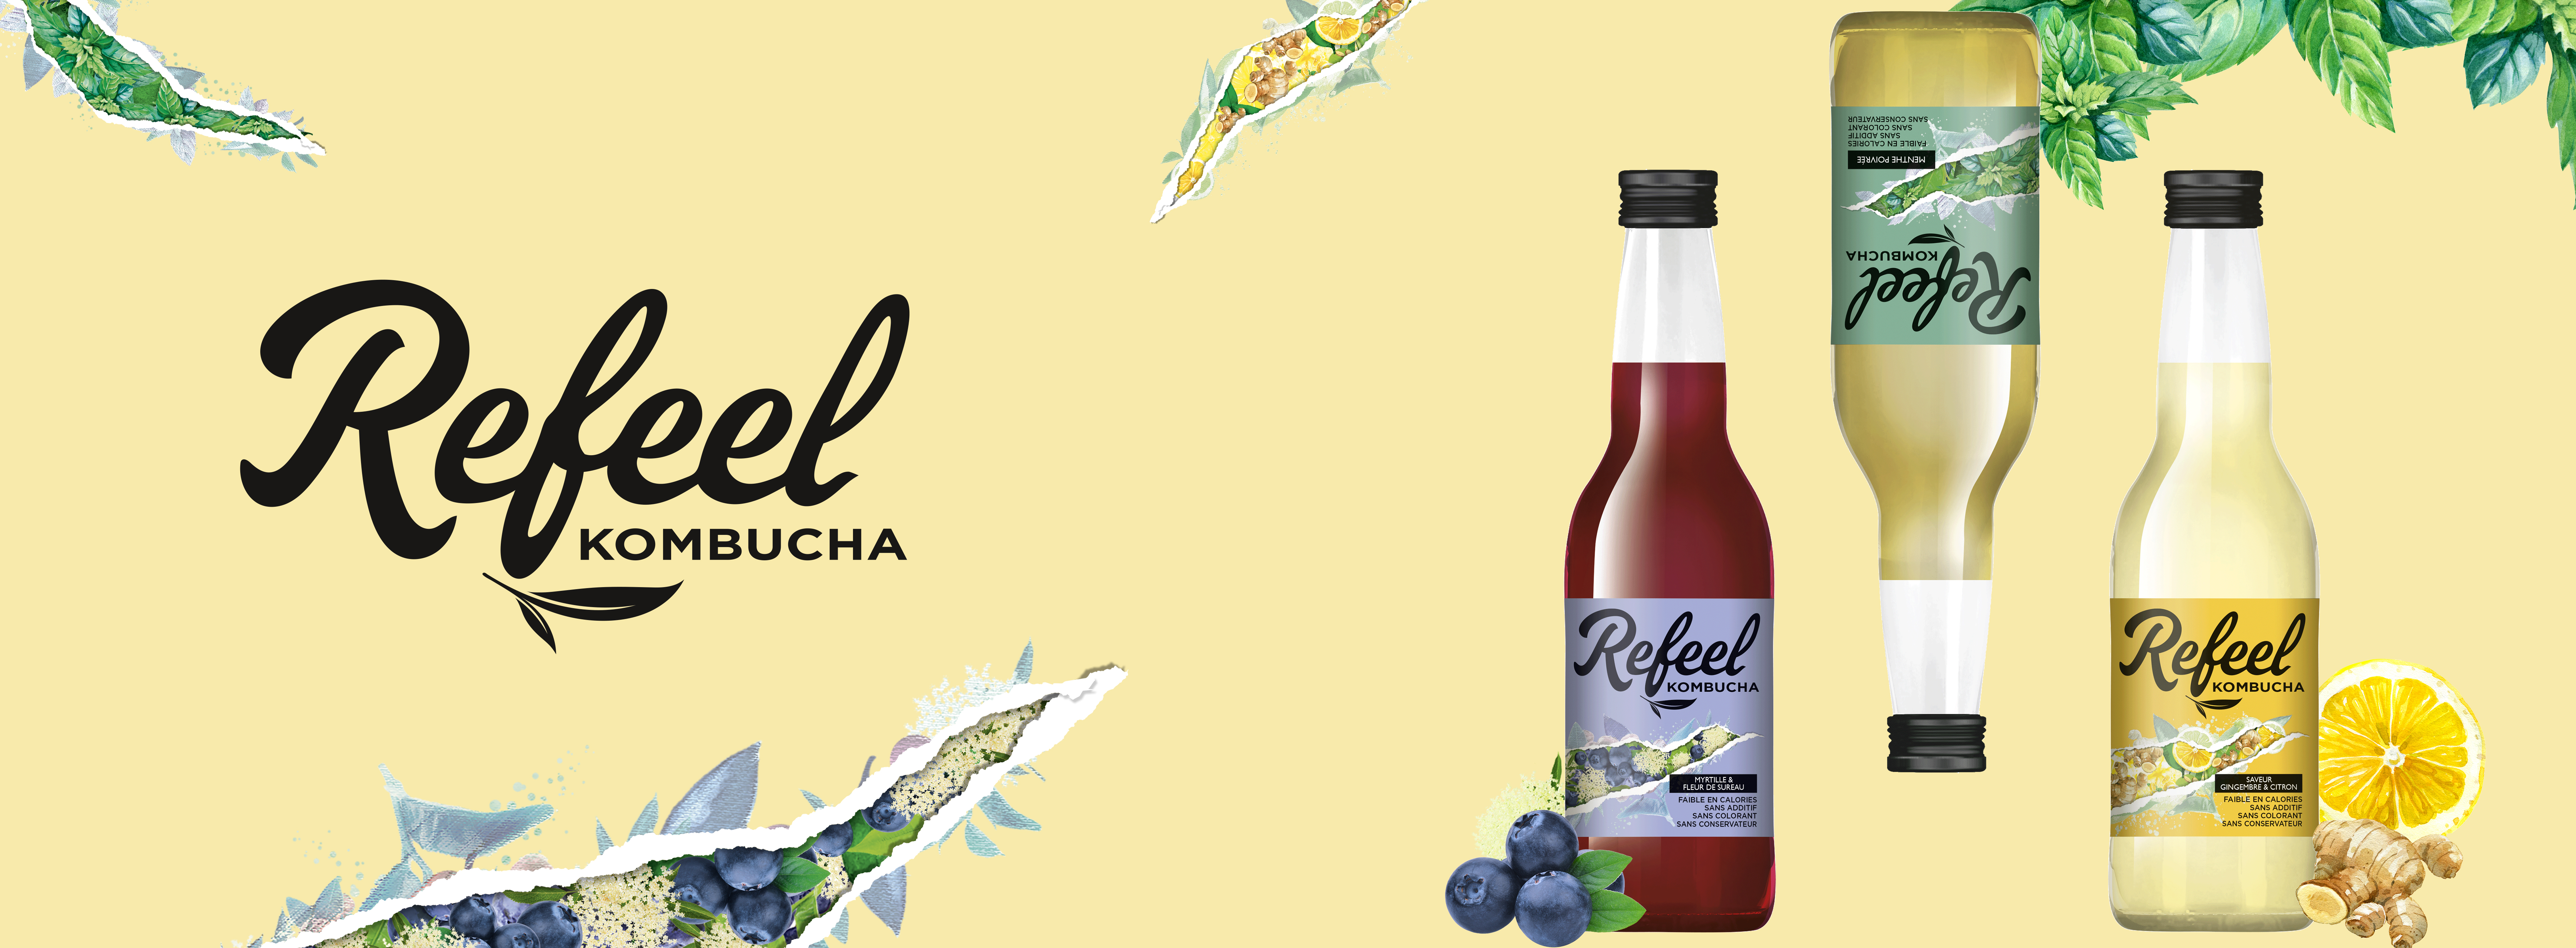 Agence design food Refeel Kombucha